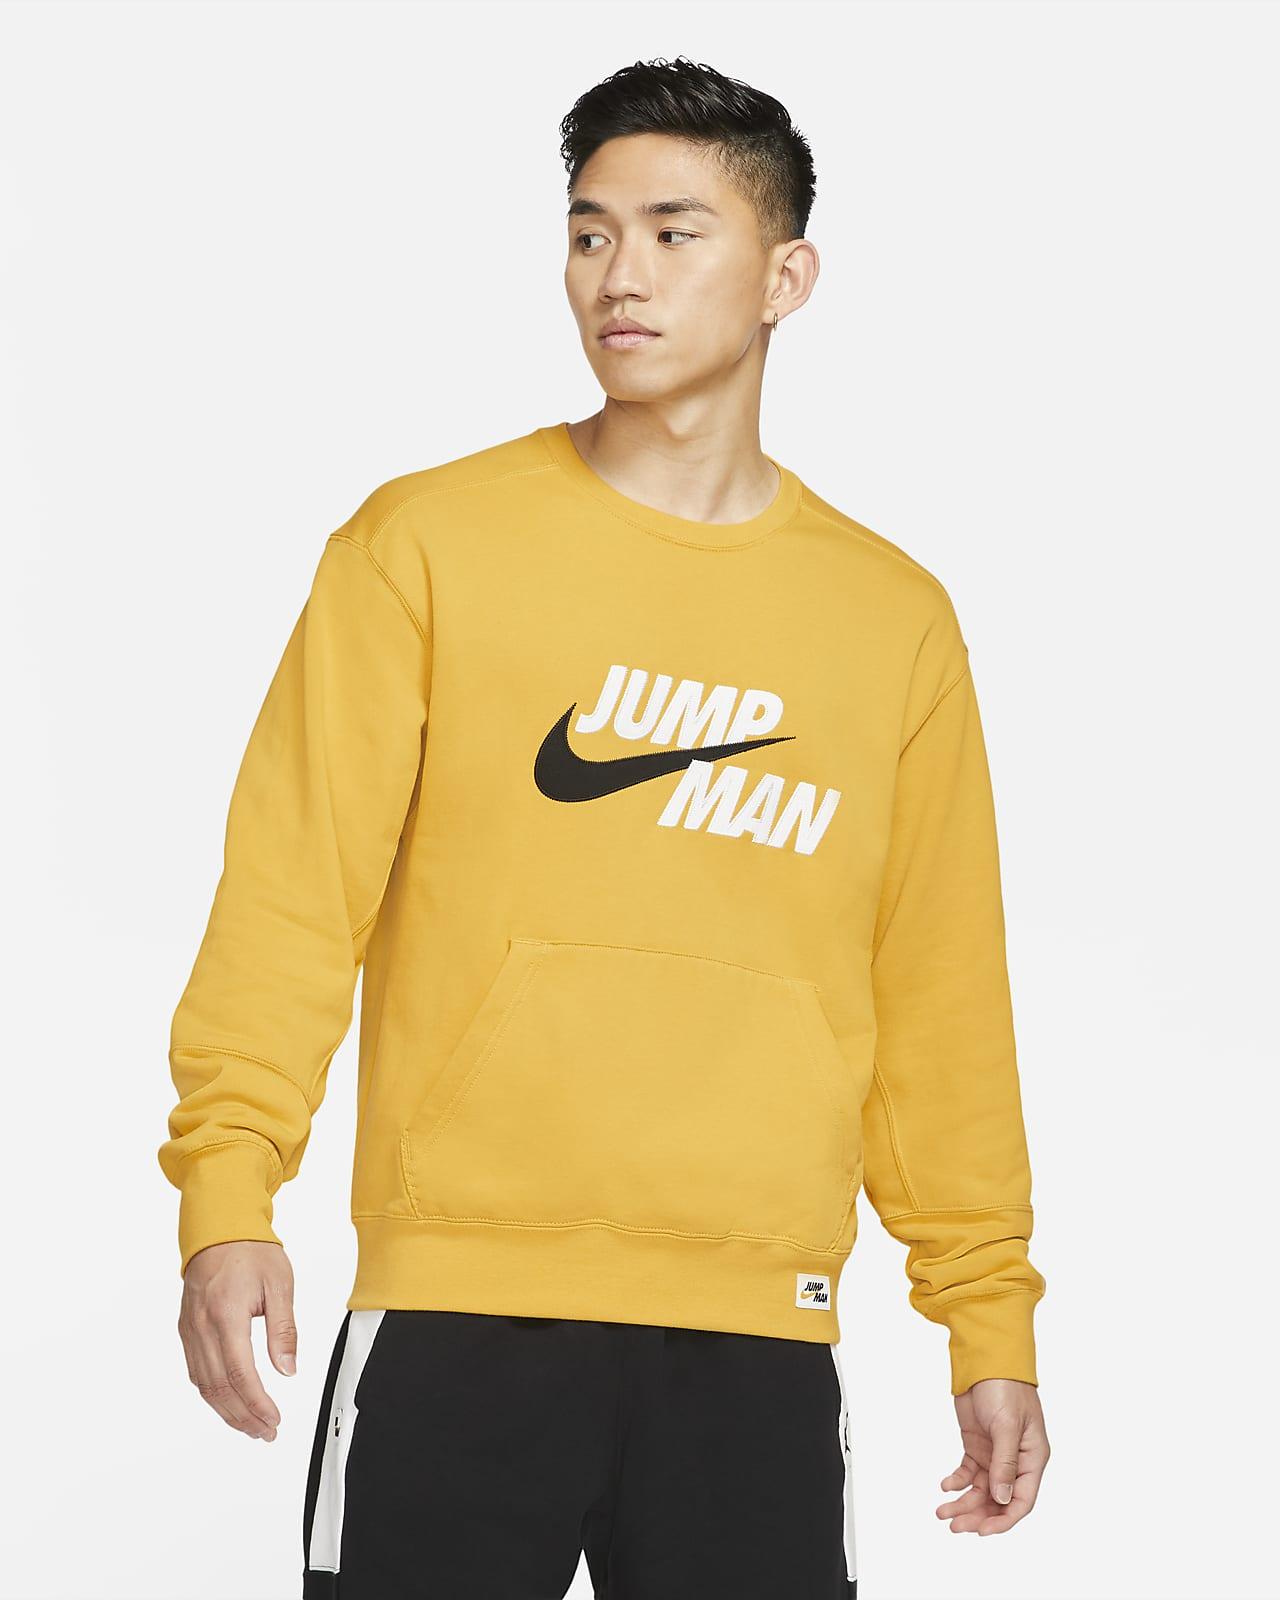 Jordan Jumpman Men's Sweatshirt